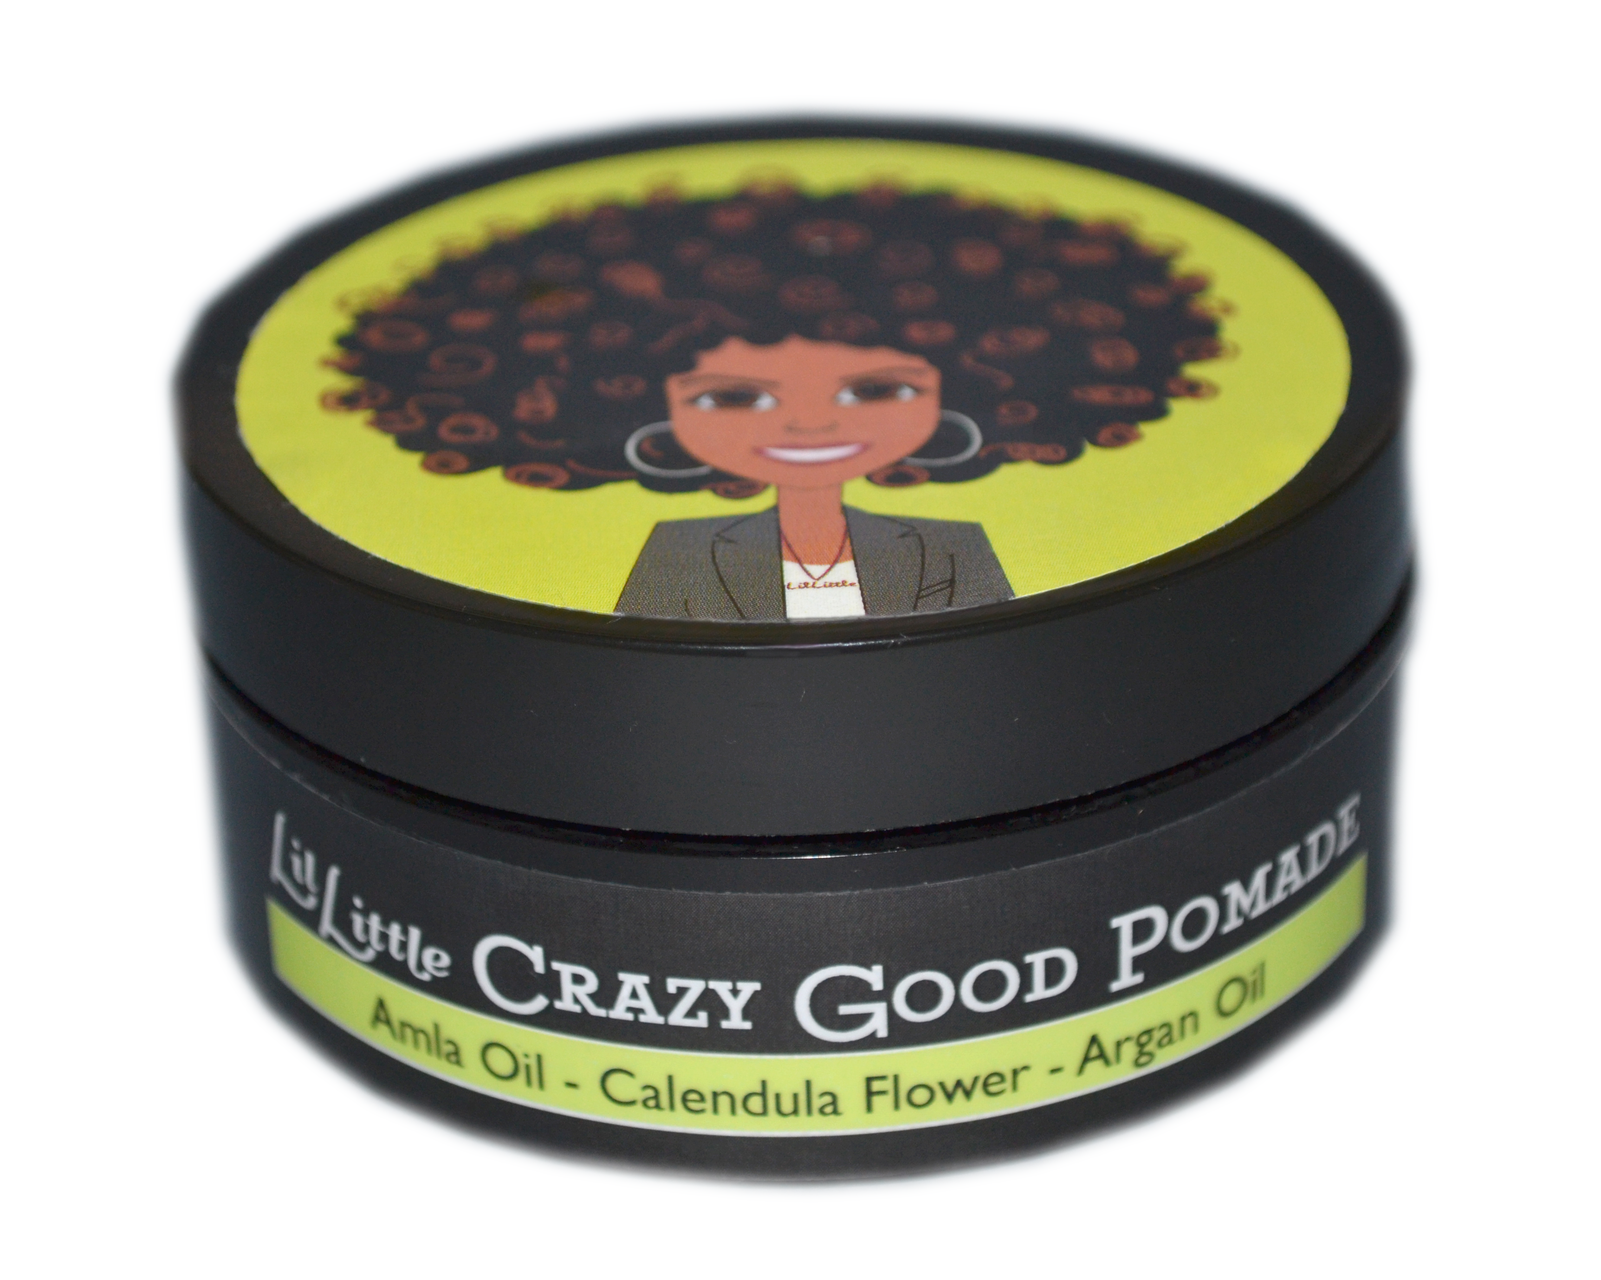 Lil Little Crazy Good Pomade w/ Amla Oil, Calendula Flower